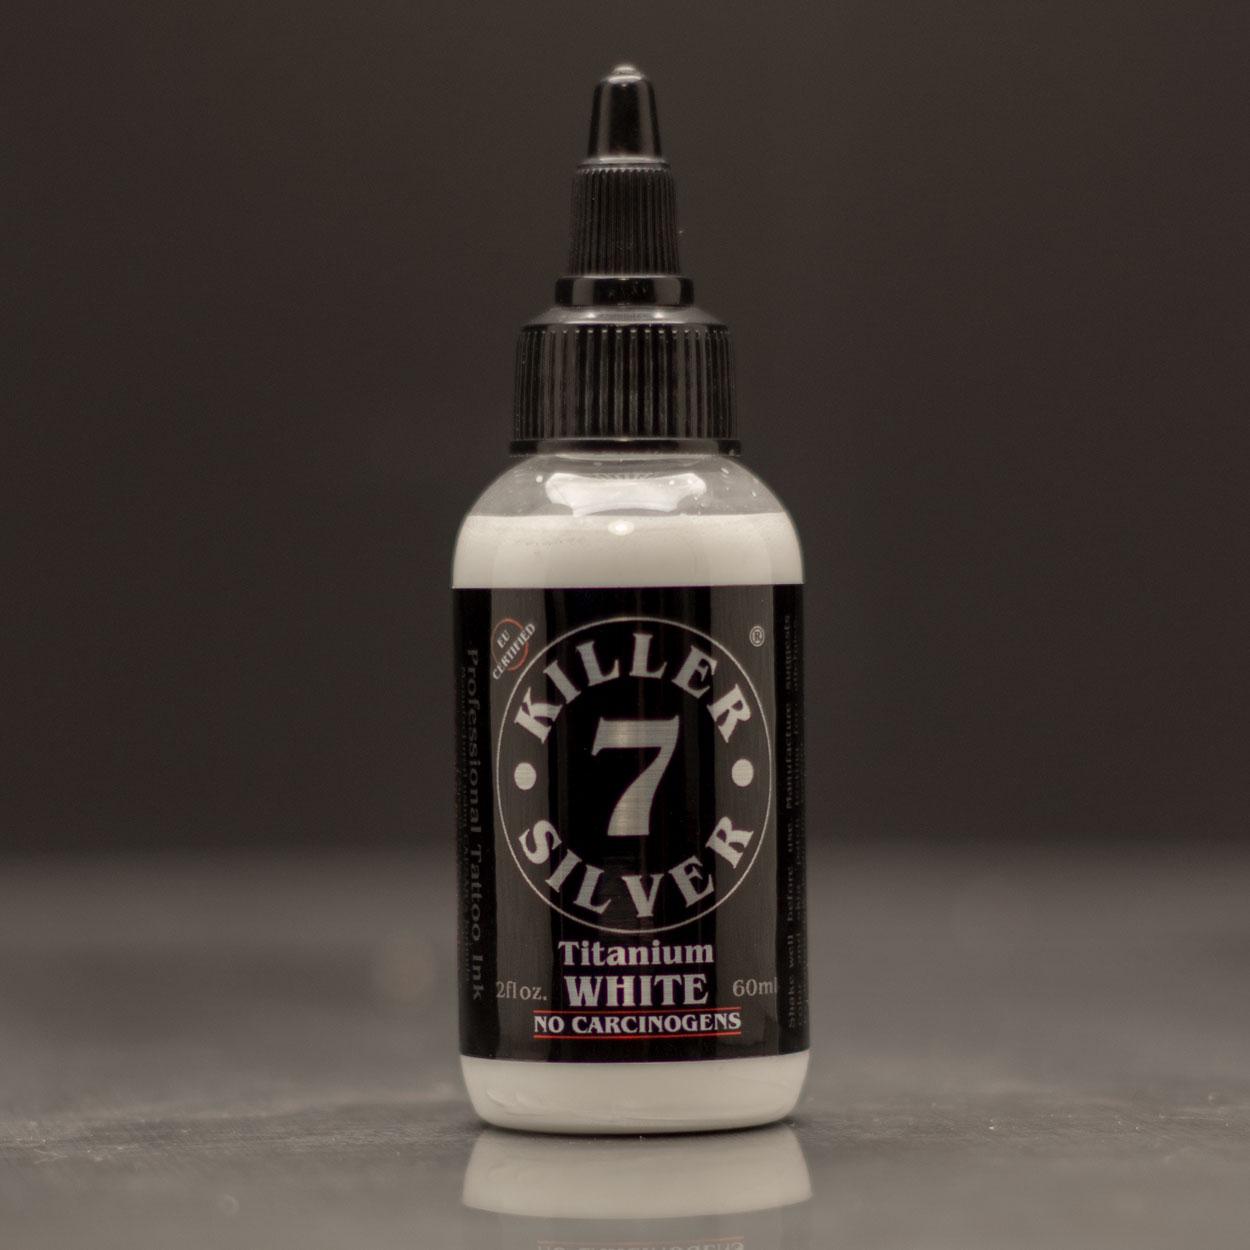 Titanium White-Professional Tattoo Ink-2 oz-Killer Silver